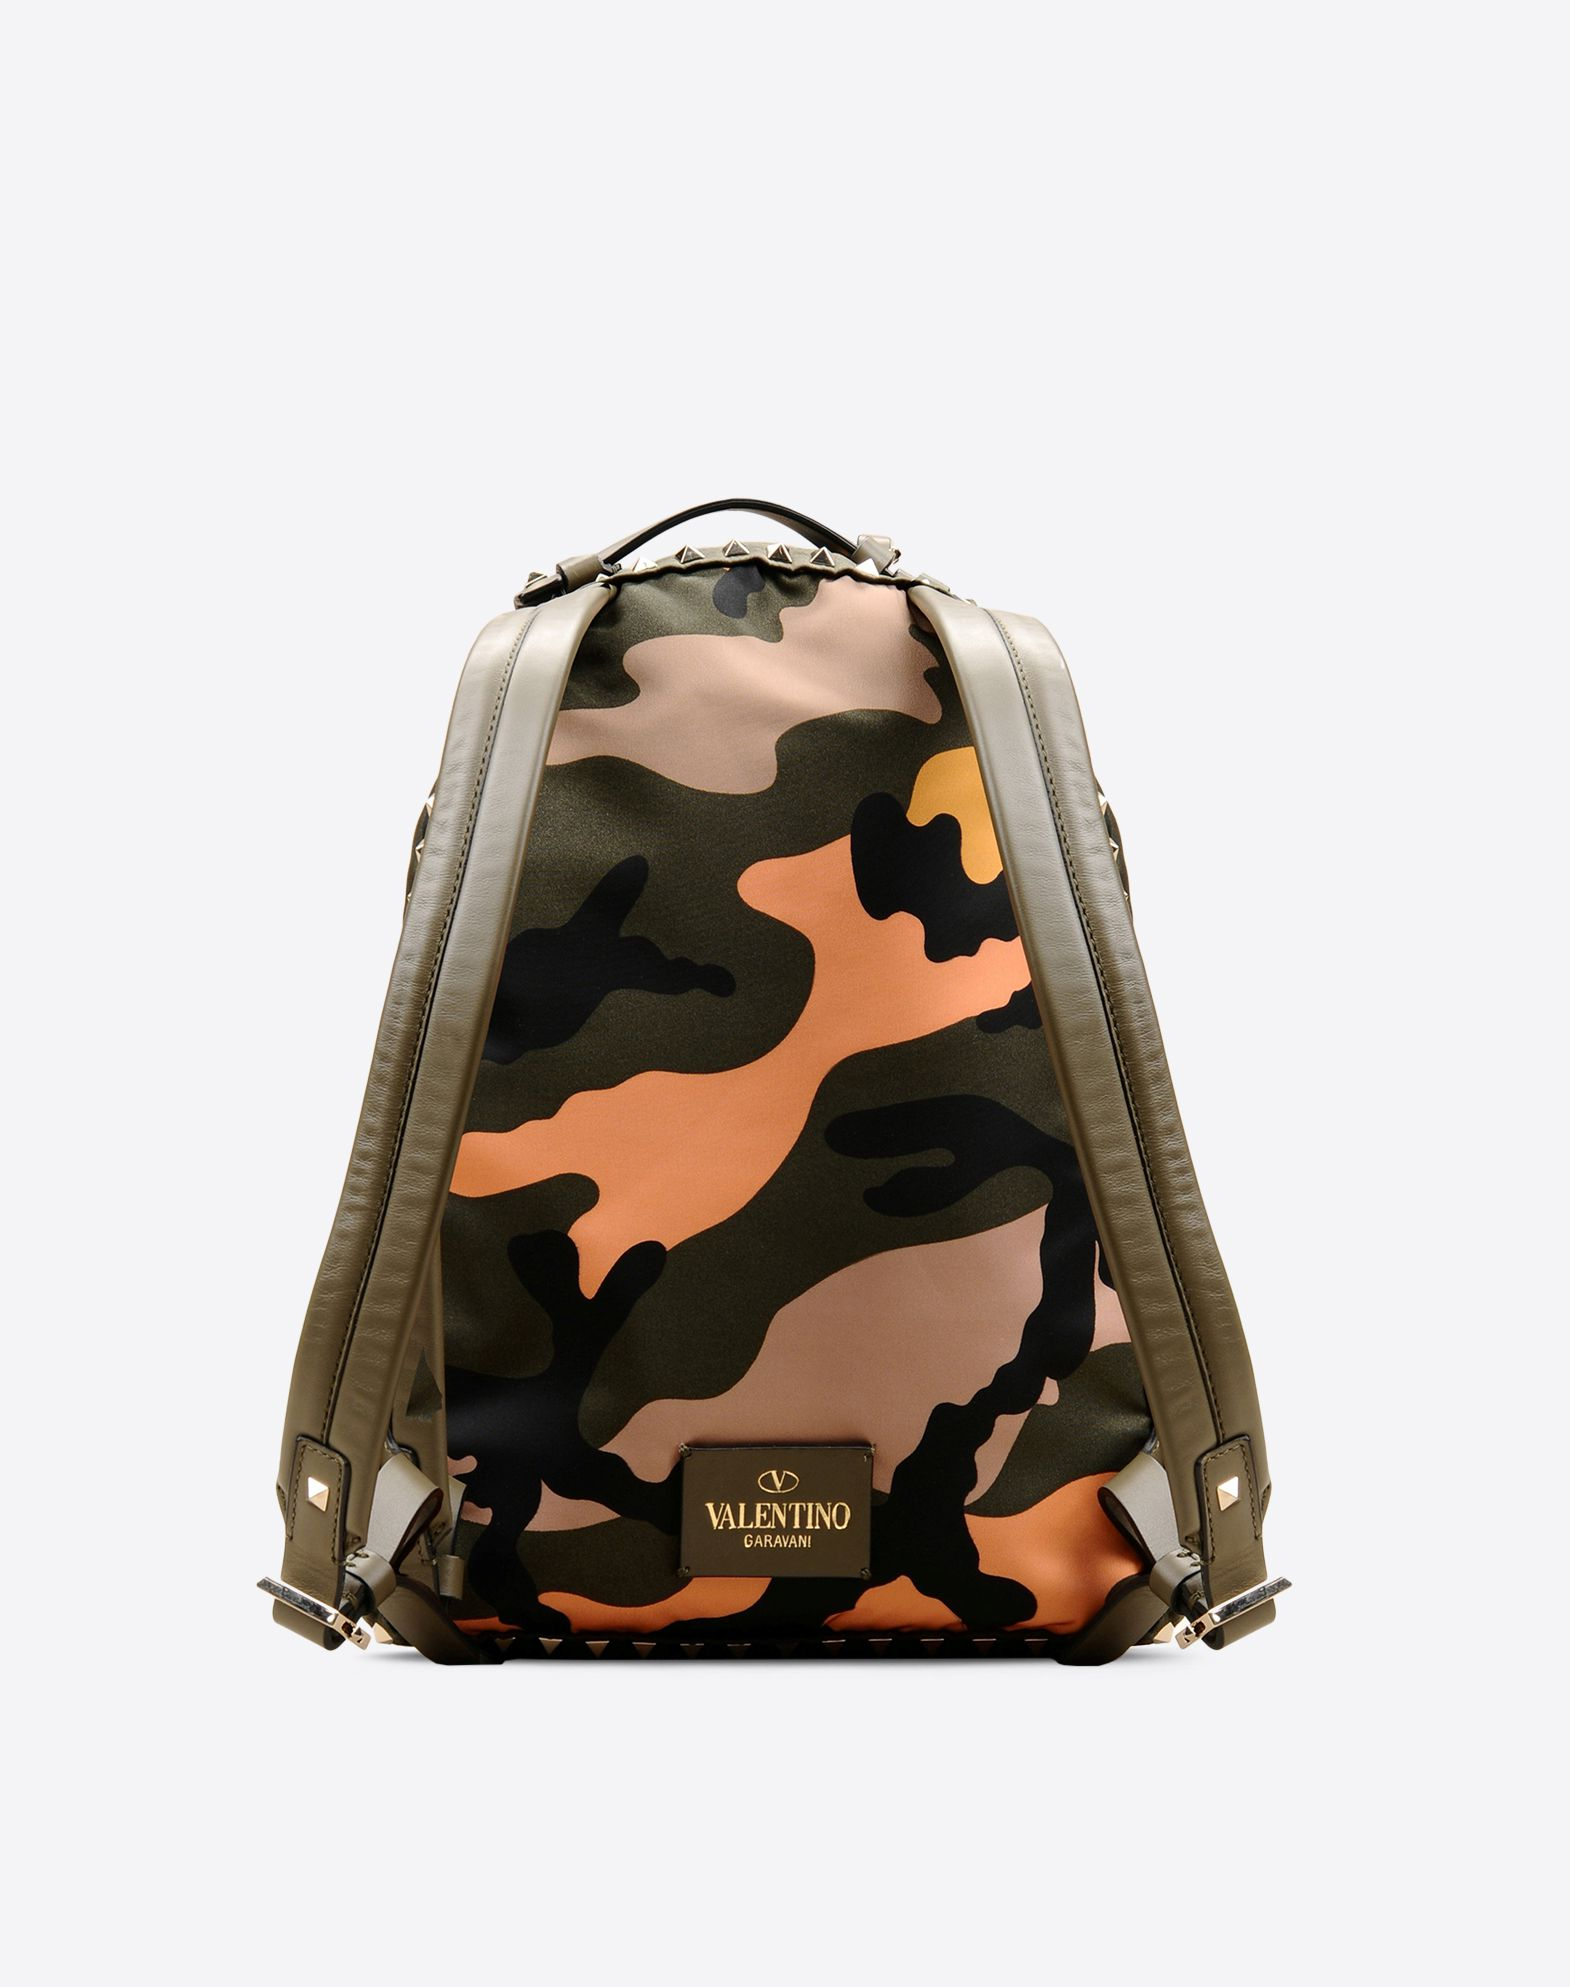 VALENTINO Logo detail Studs Techno fabric Camouflage design Zip closure Lined interior  45280752nq